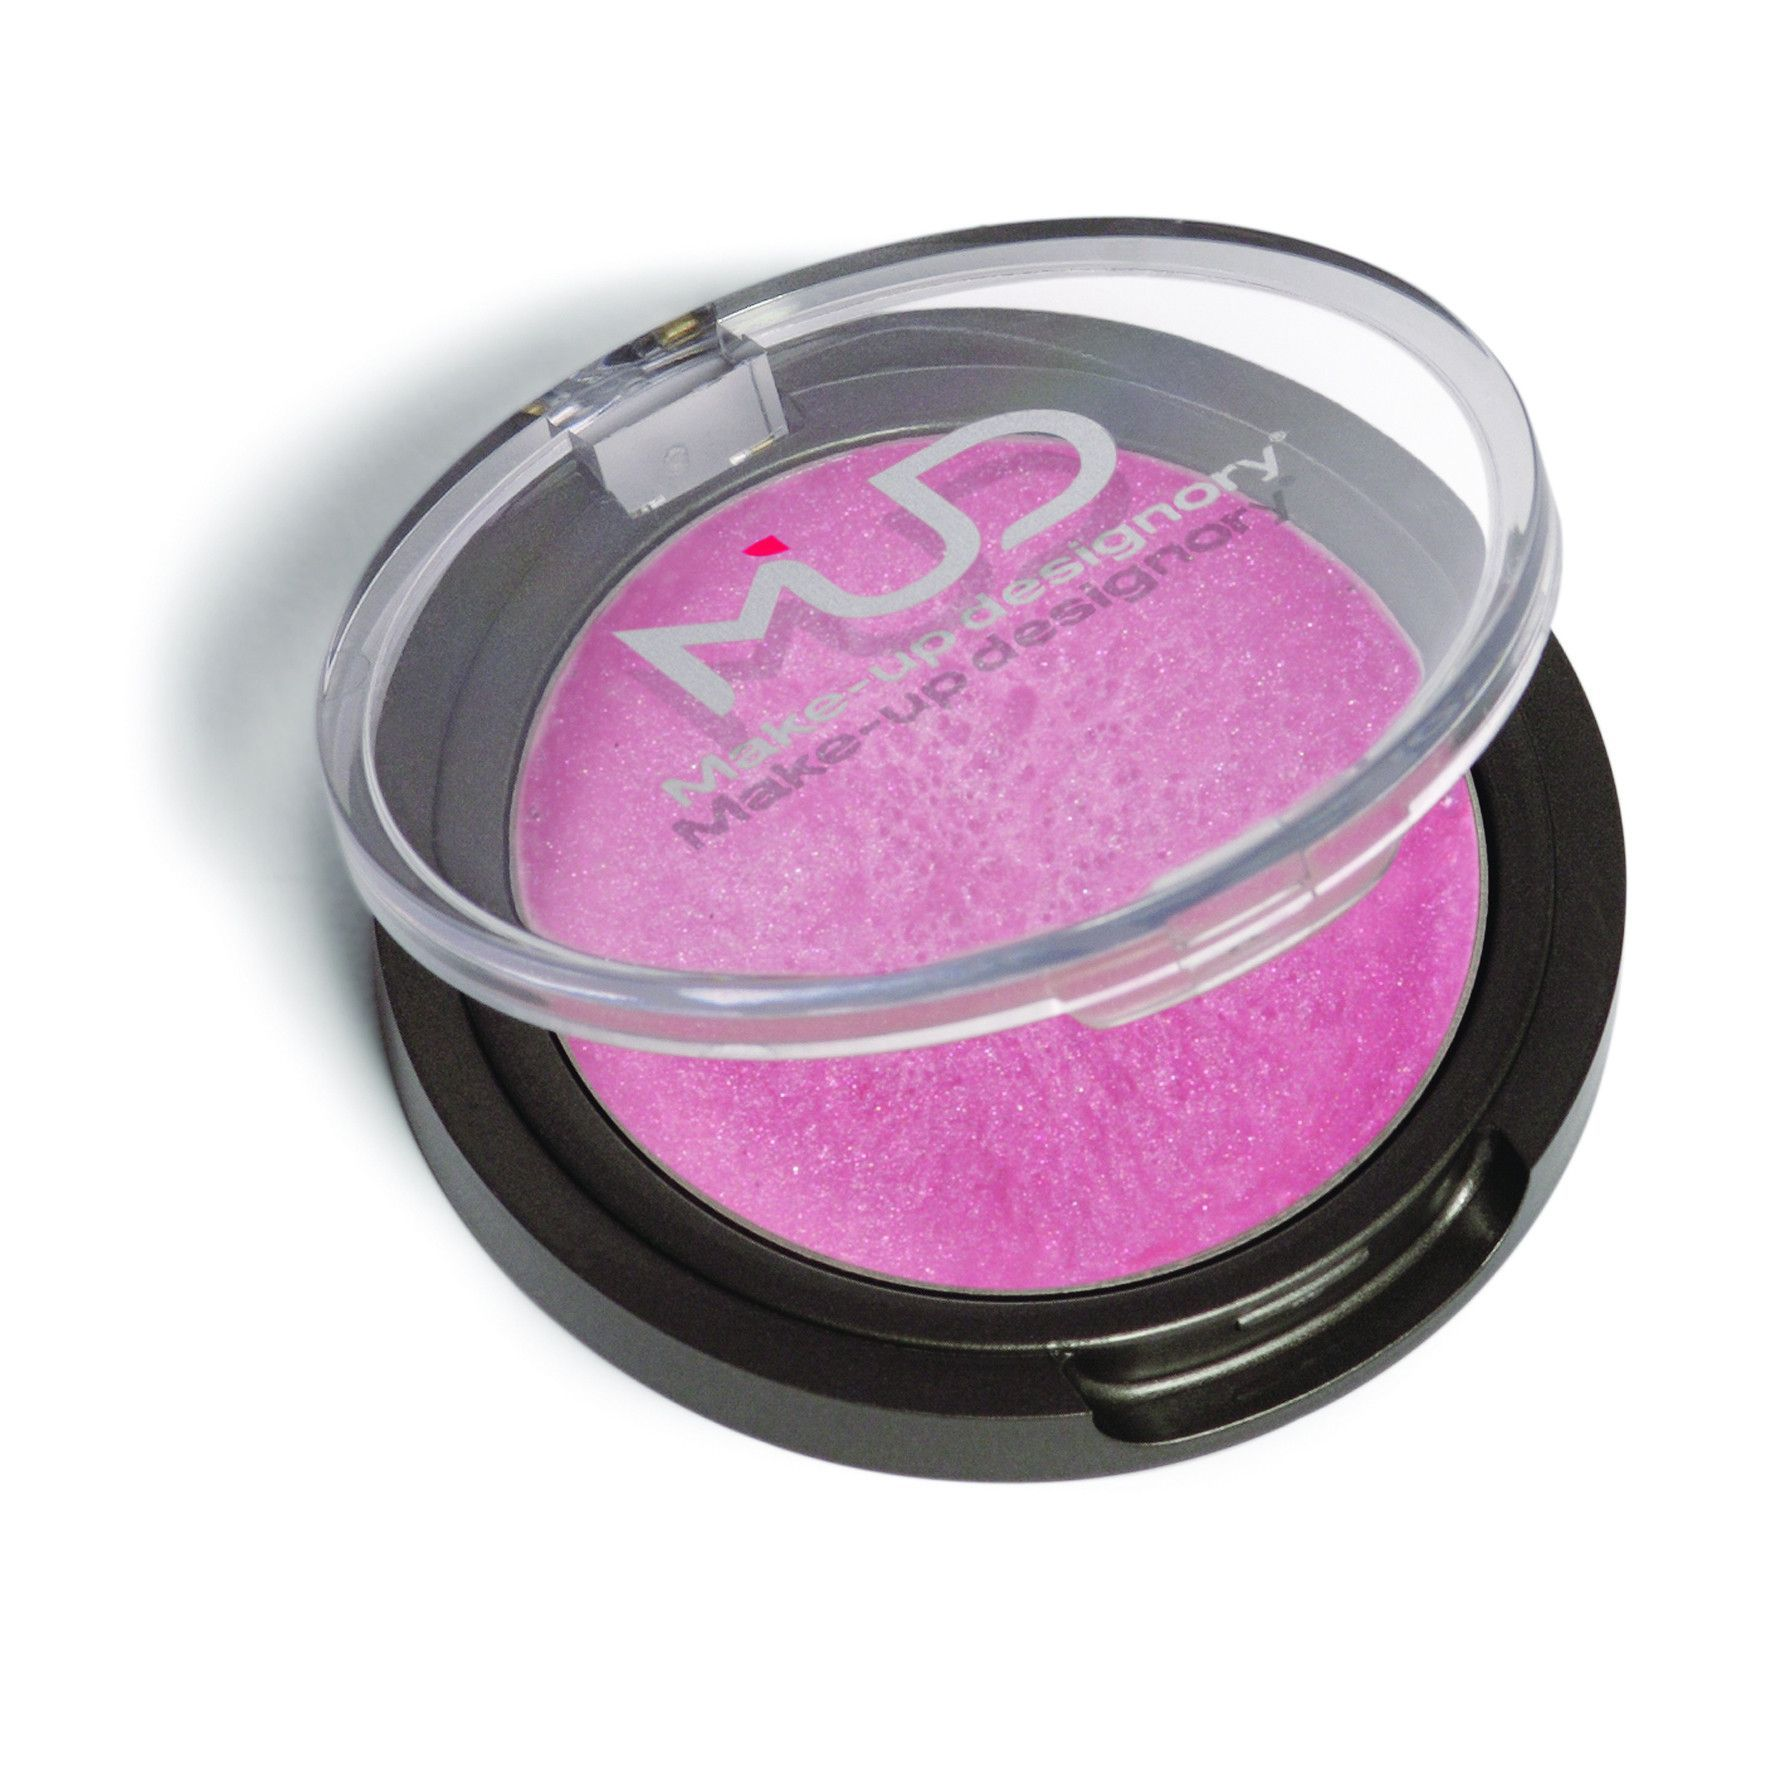 Mud Pink Freeze Lip Gloss with LA Fresh Makeup Remover